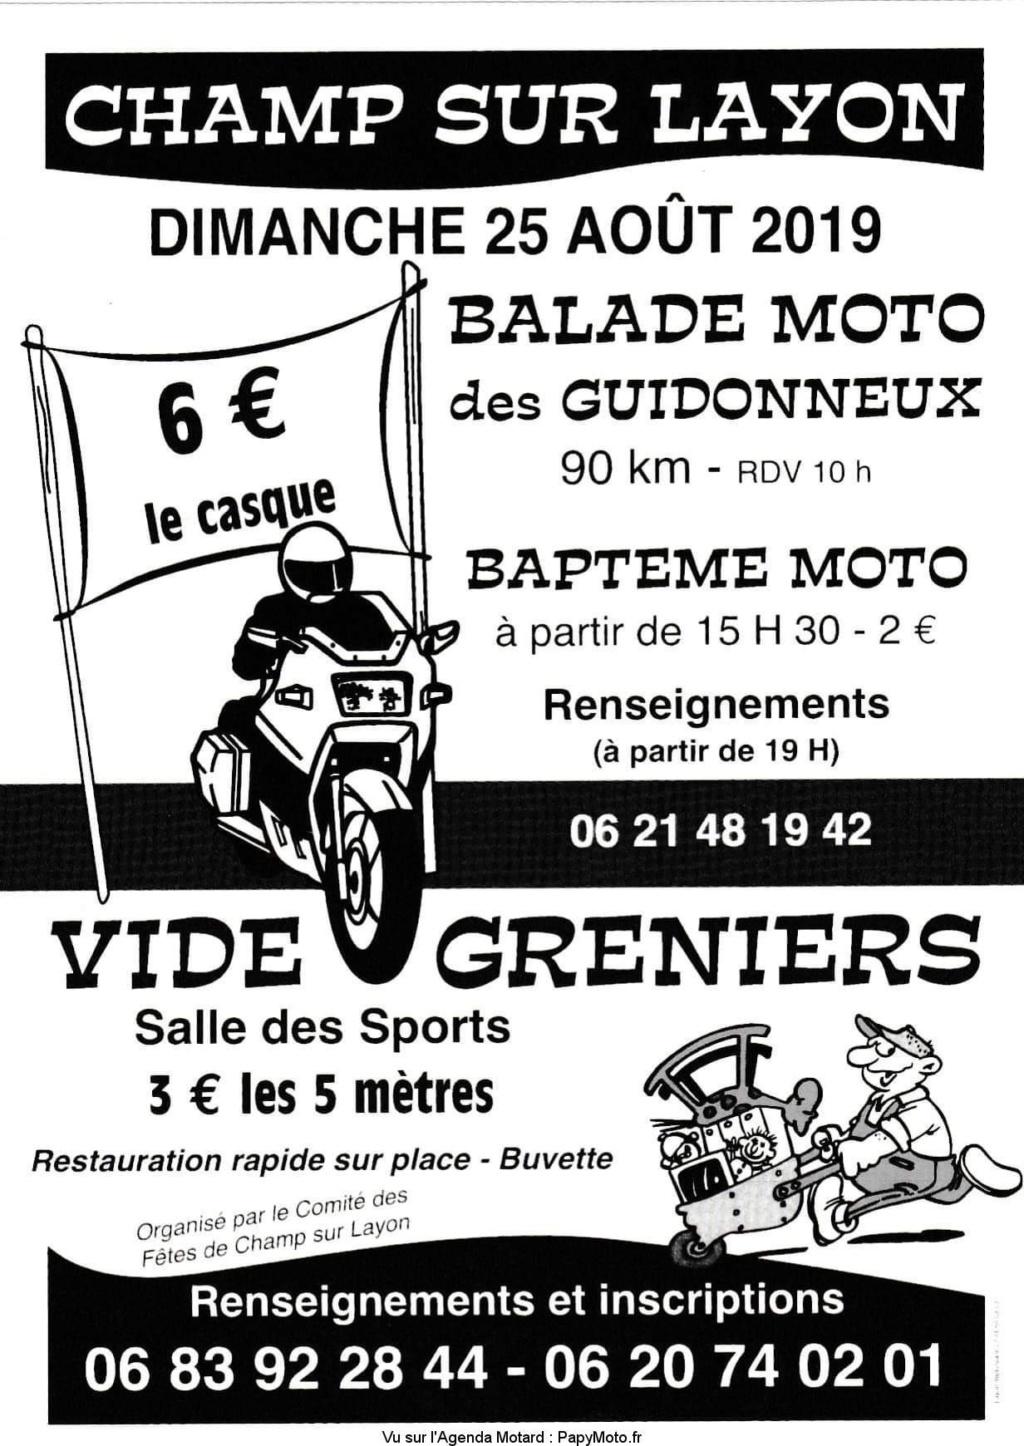 MANIFESTATION  -  Balade Moto & vide Greniers - Dimanche 25 AOUT  2019 - Champs sur Layon  Balad112